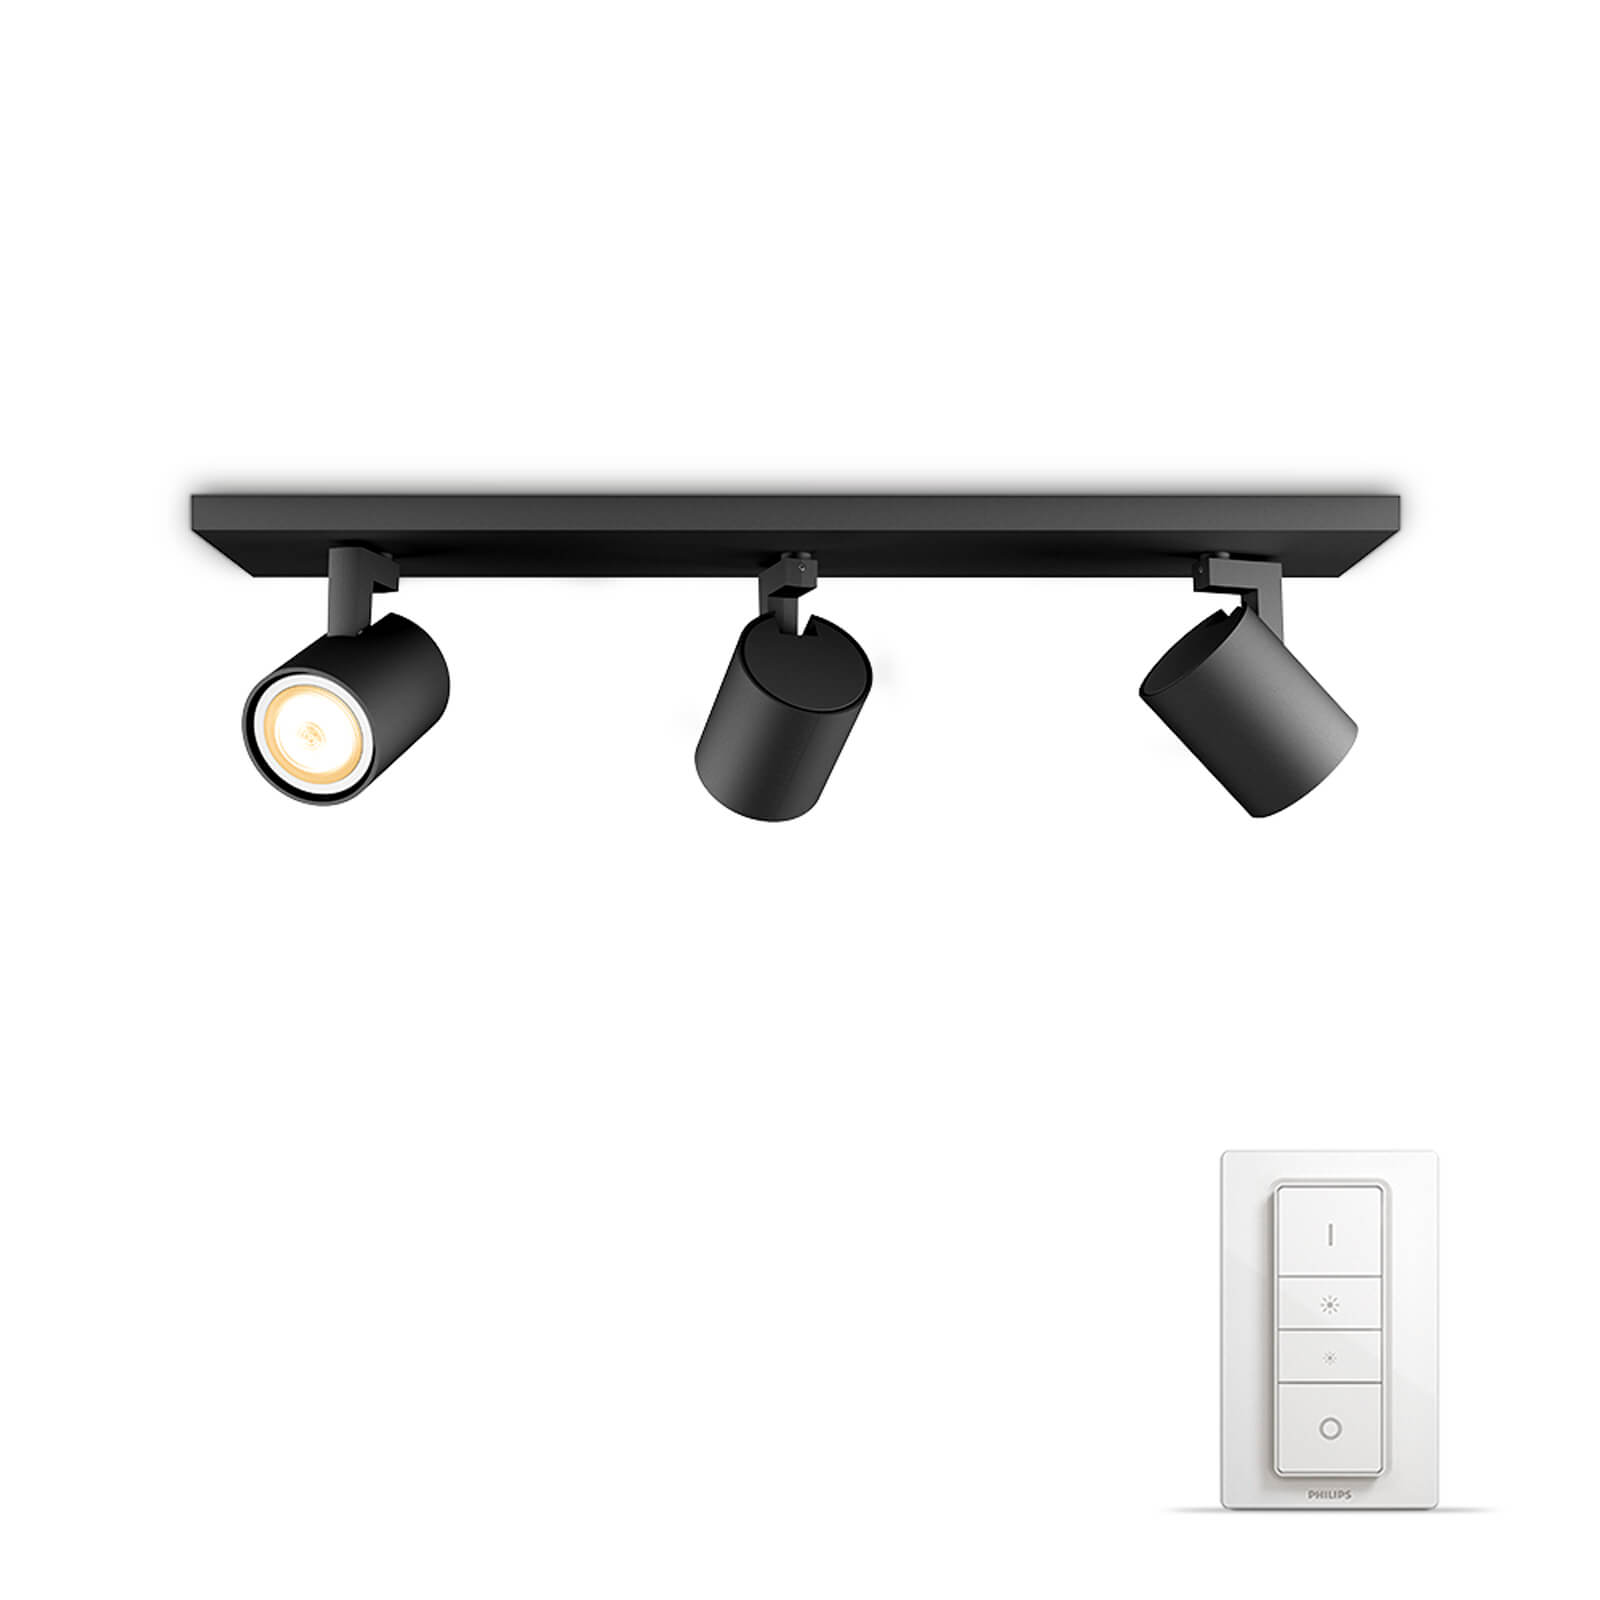 philips hue runner 3 spot zwart white ambiance incl dim switch. Black Bedroom Furniture Sets. Home Design Ideas